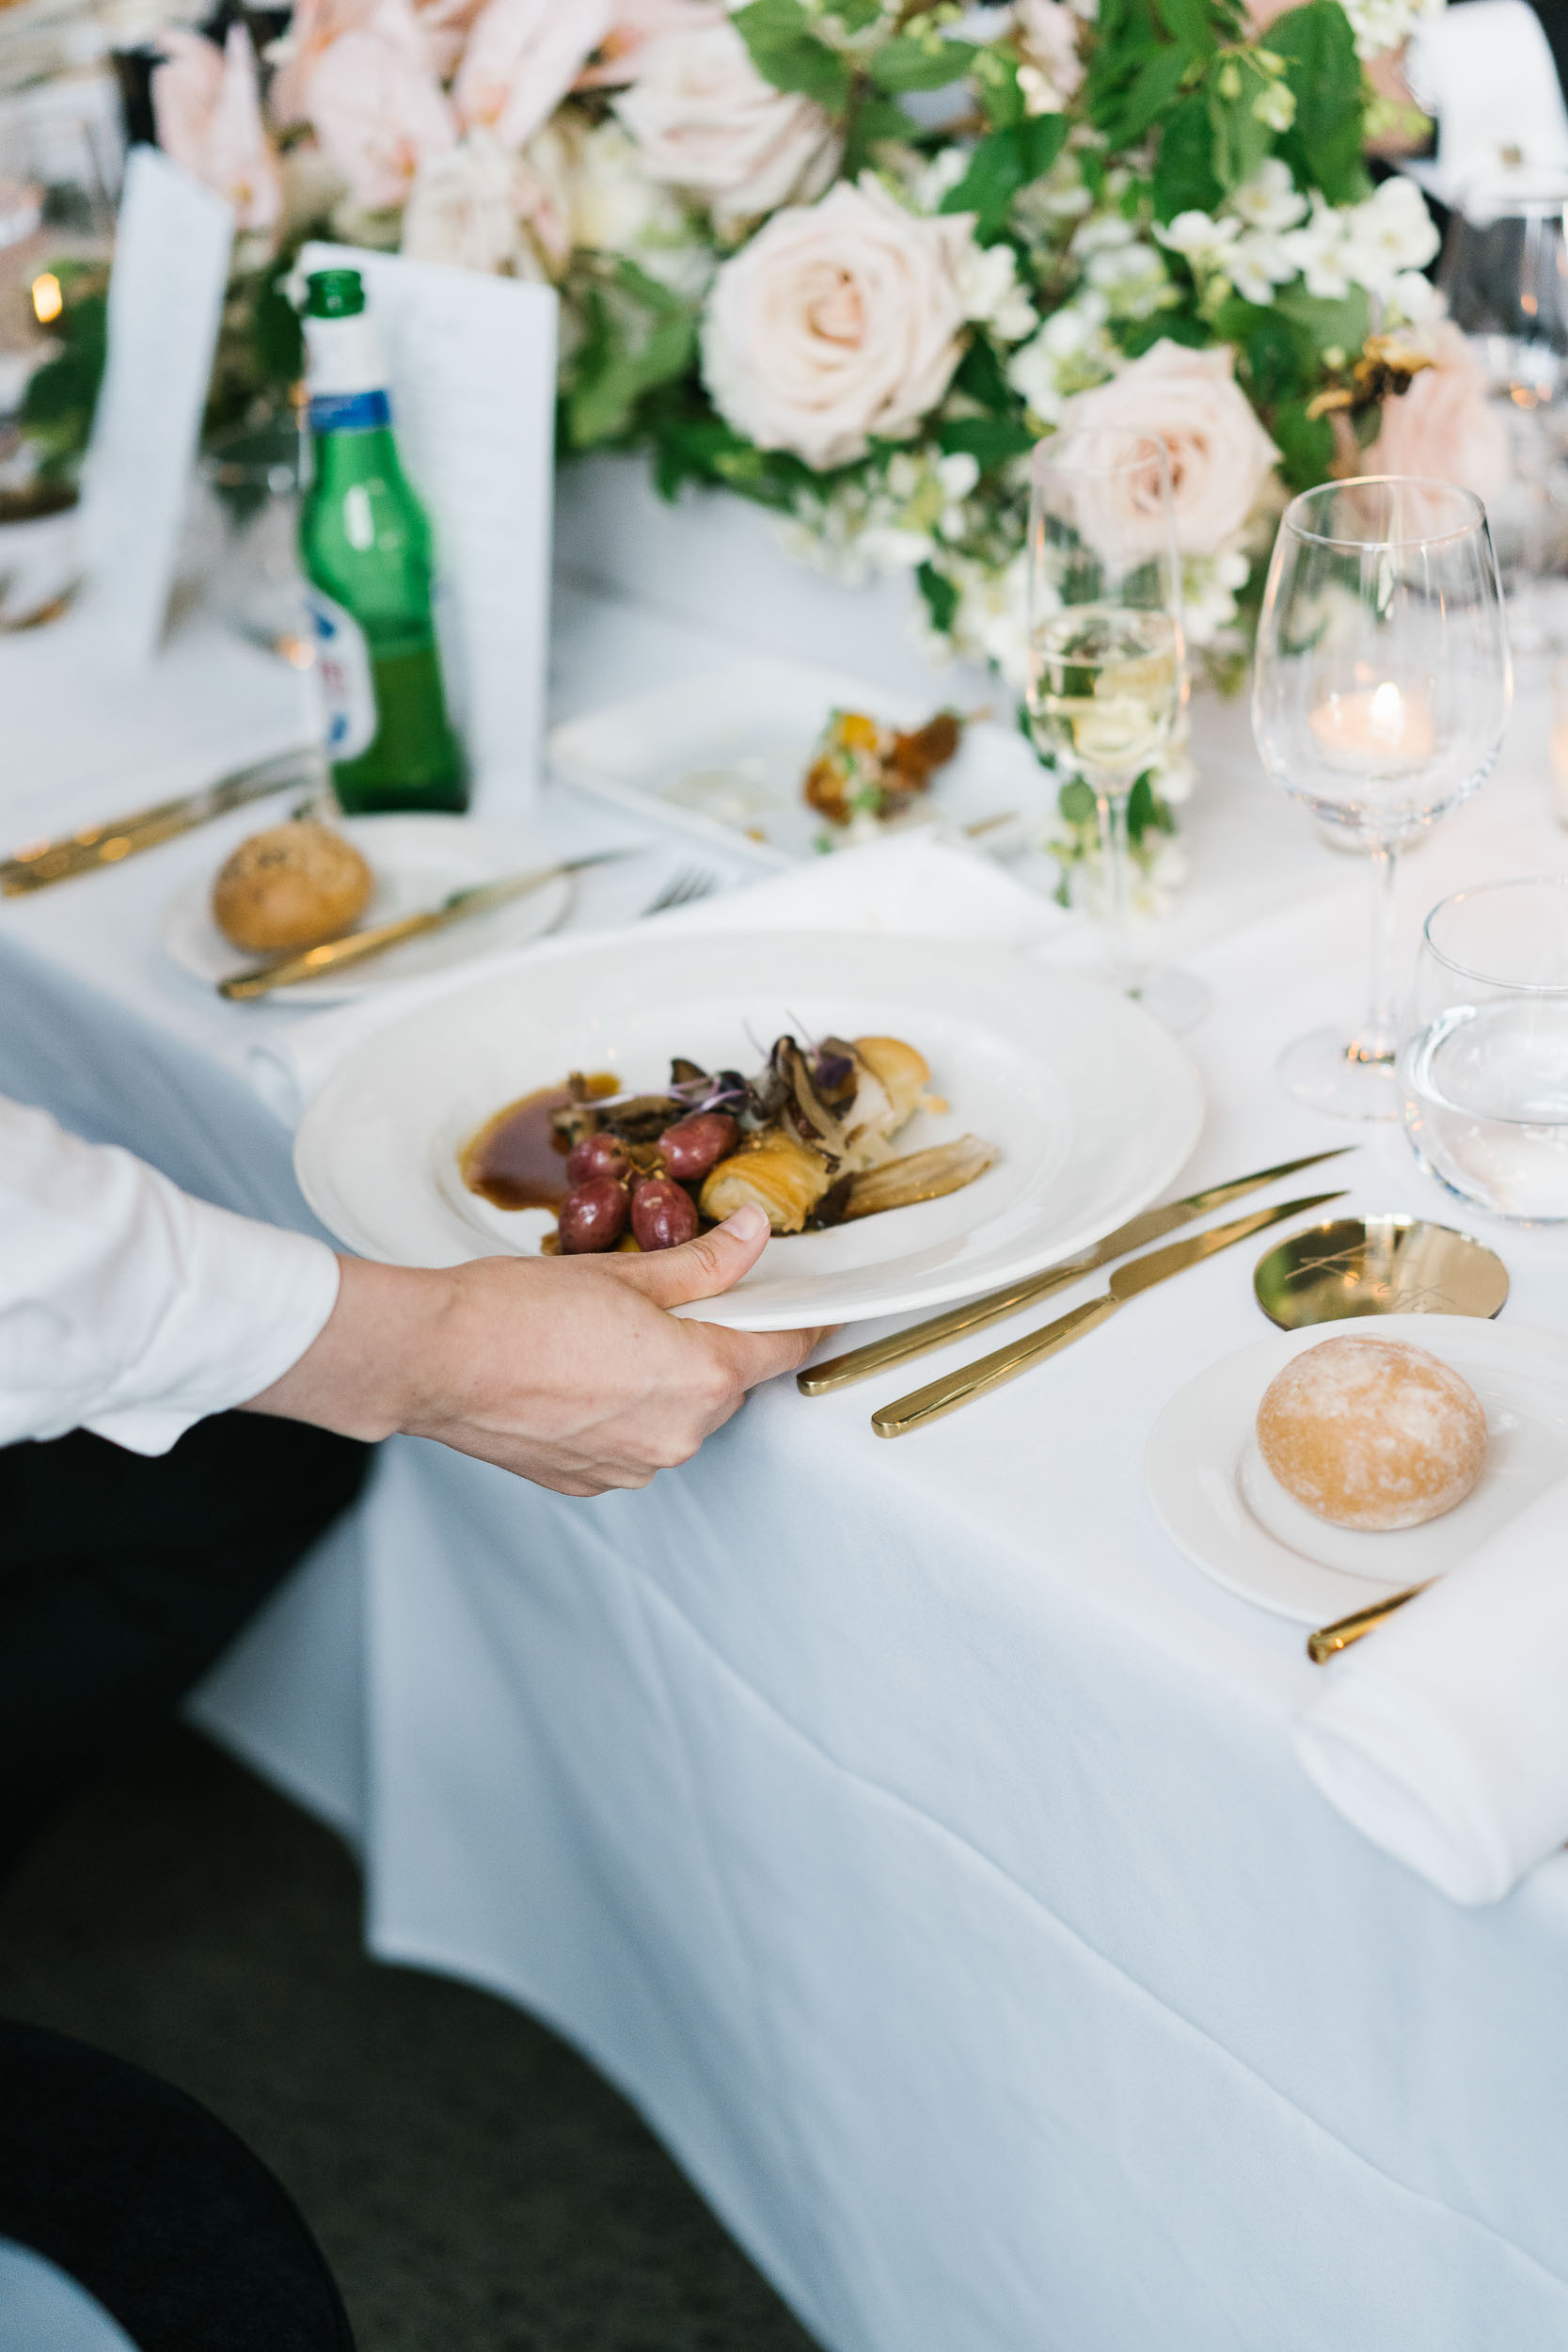 Kas-Richards-Wedding-Photographer-Melbourne-City-Wedding-Alto-Event-Space-Jane-Hill-Bridal-Gown-60.jpg